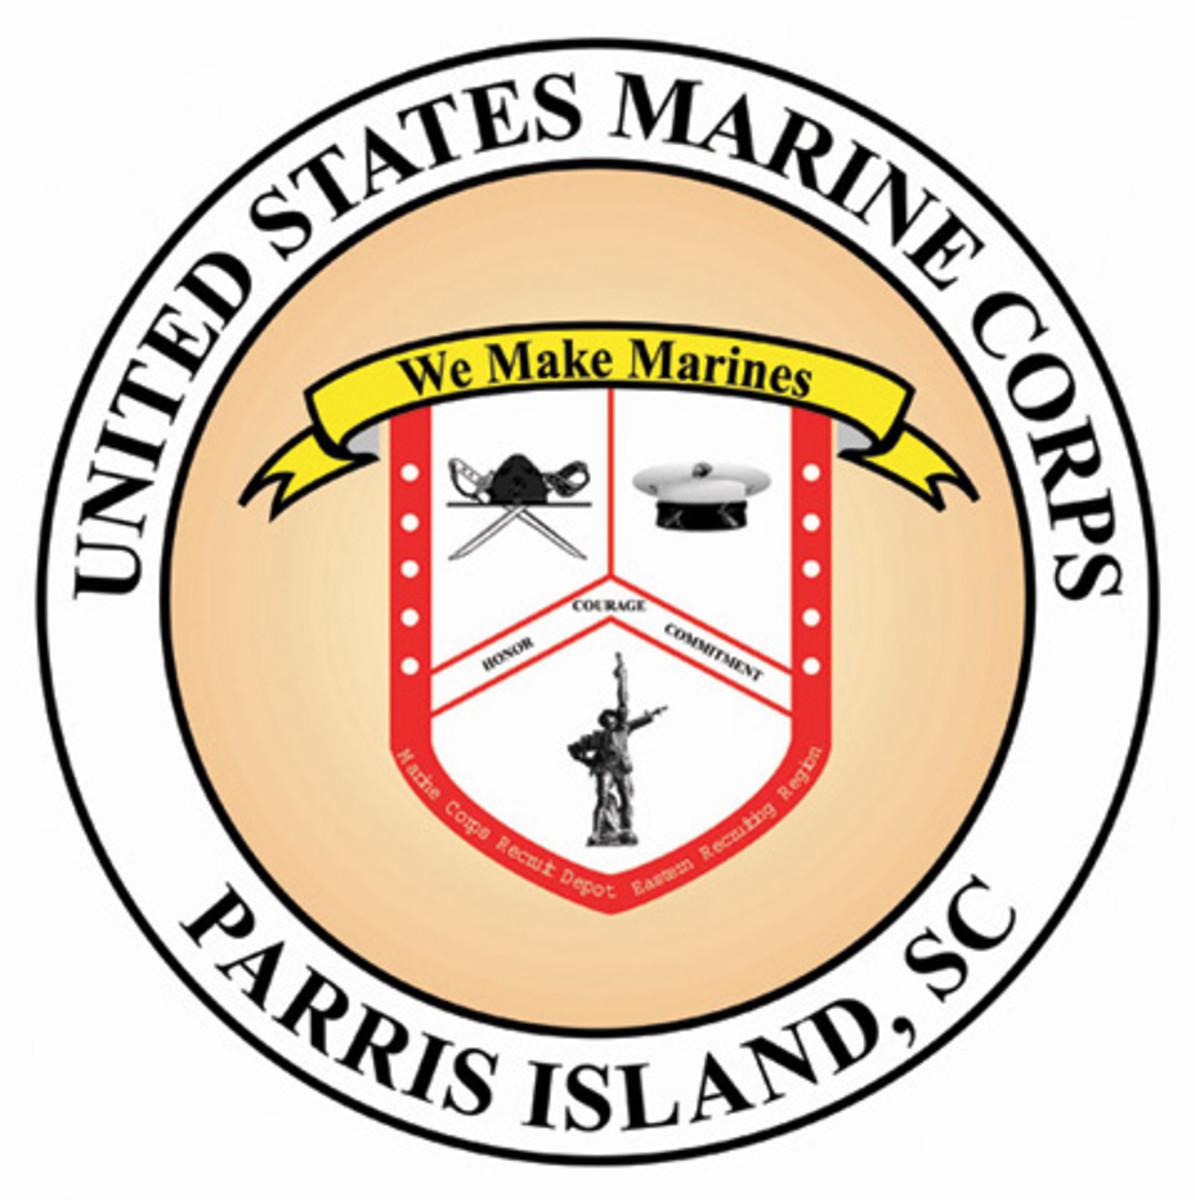 MCRD, PISC logo